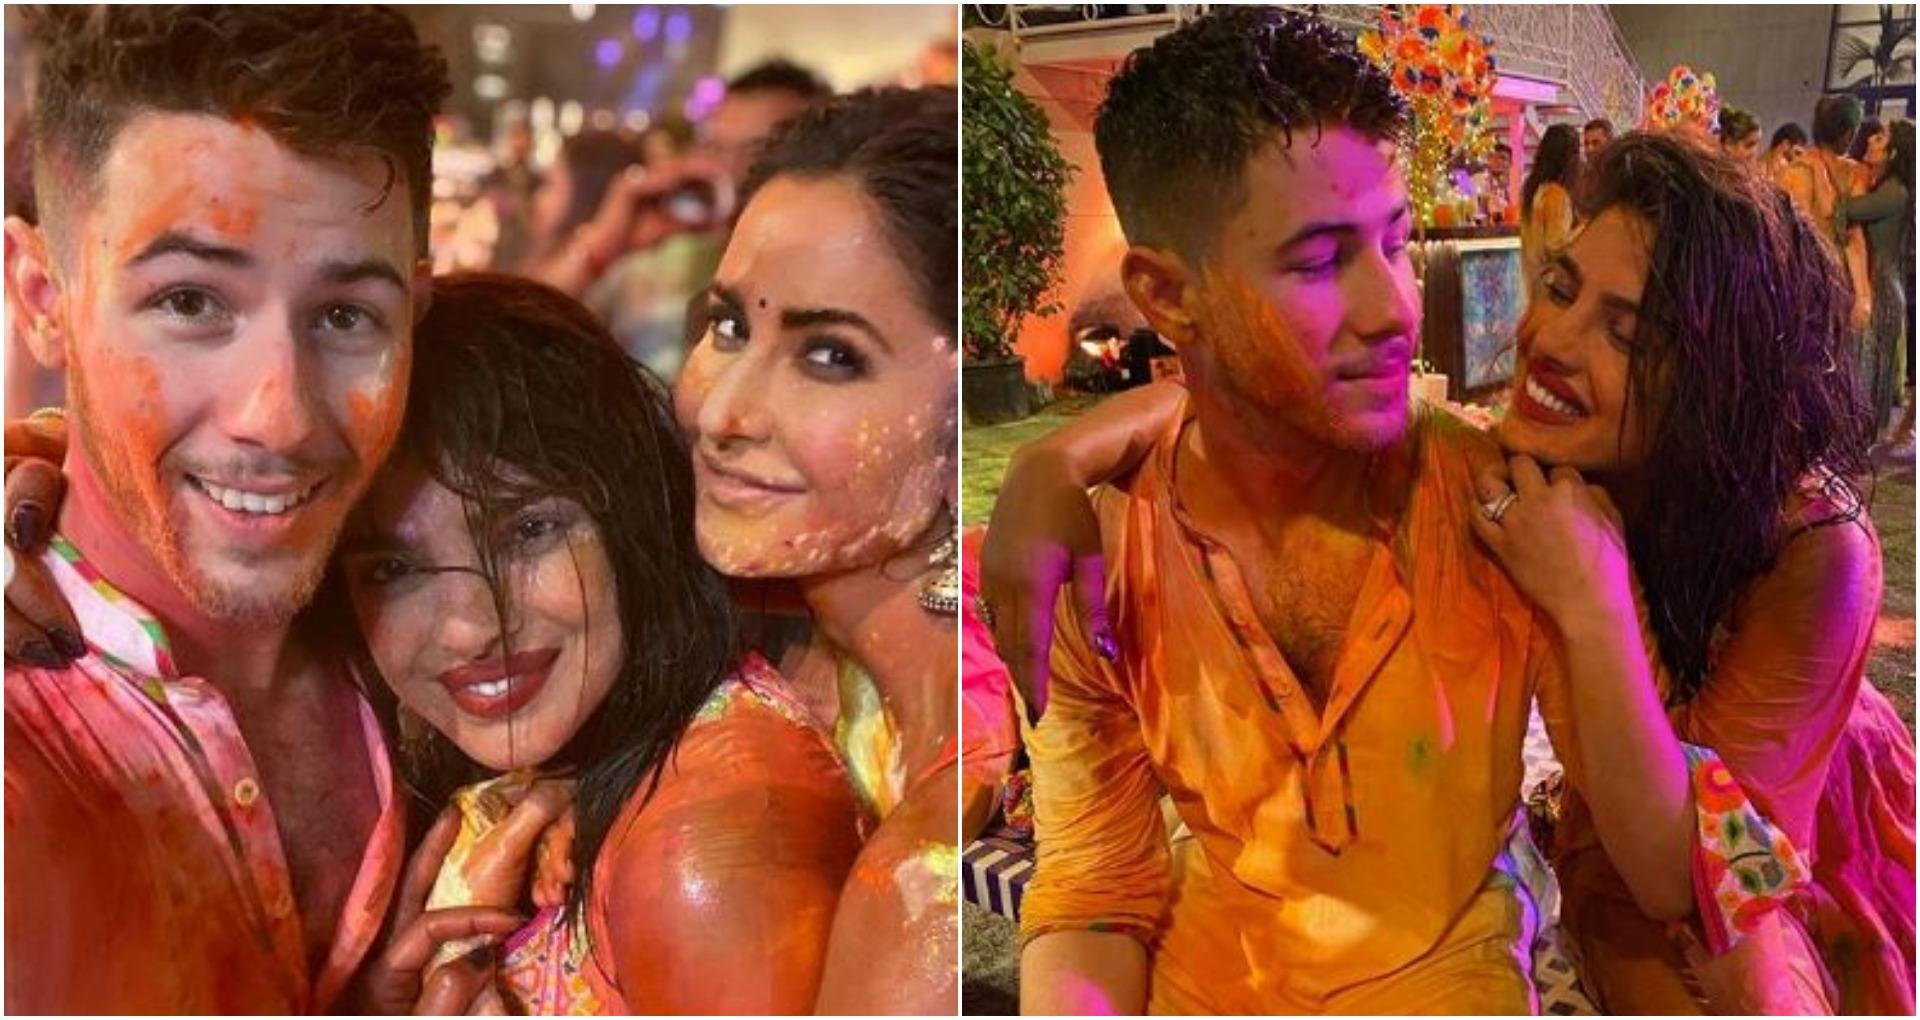 Holi 2020: प्रियंका चोपड़ा ने पति निक जोनास संग जमकर खेली होली, यूं मारी पिचकारी, वायरल हुआ Video